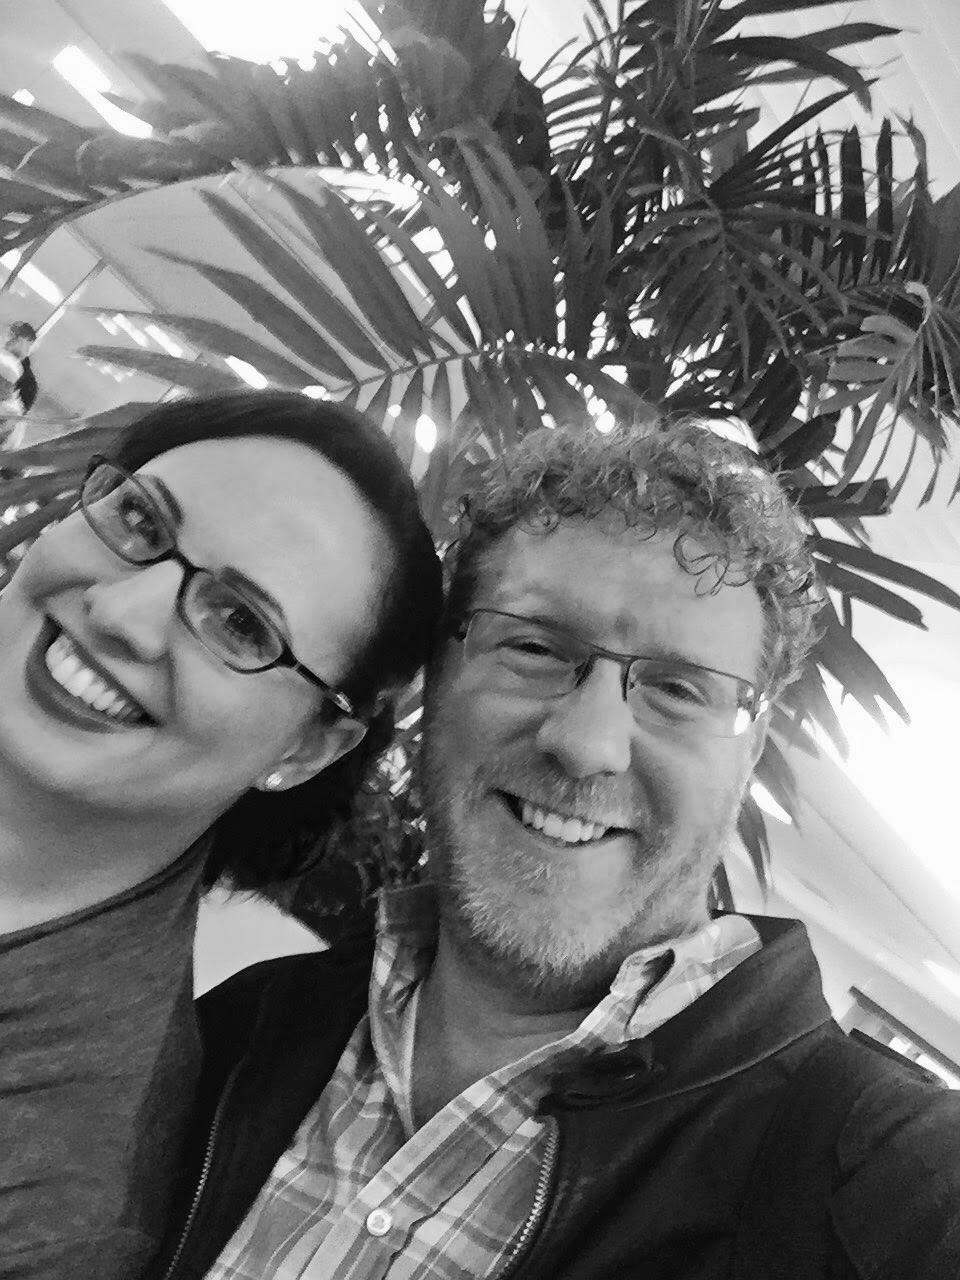 Authors Brendan Kiely and Kristy Acevedo